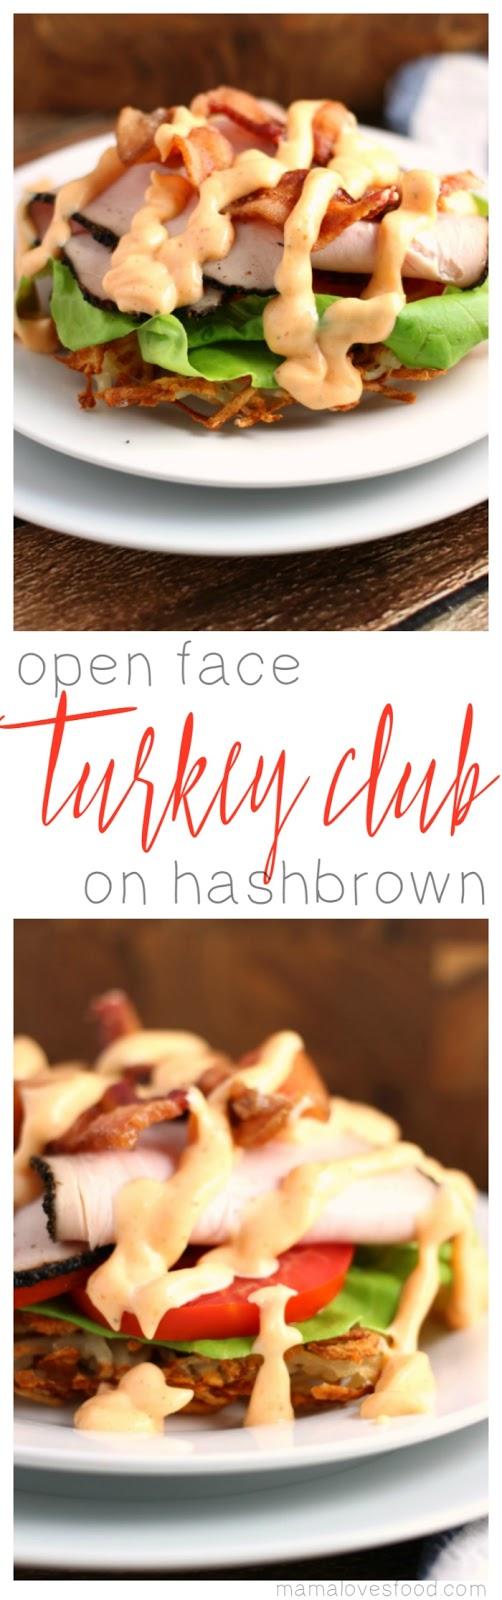 Open Face Hashbrown Turkey Club with Sweet Sriracha Garlic Mayo Recipe